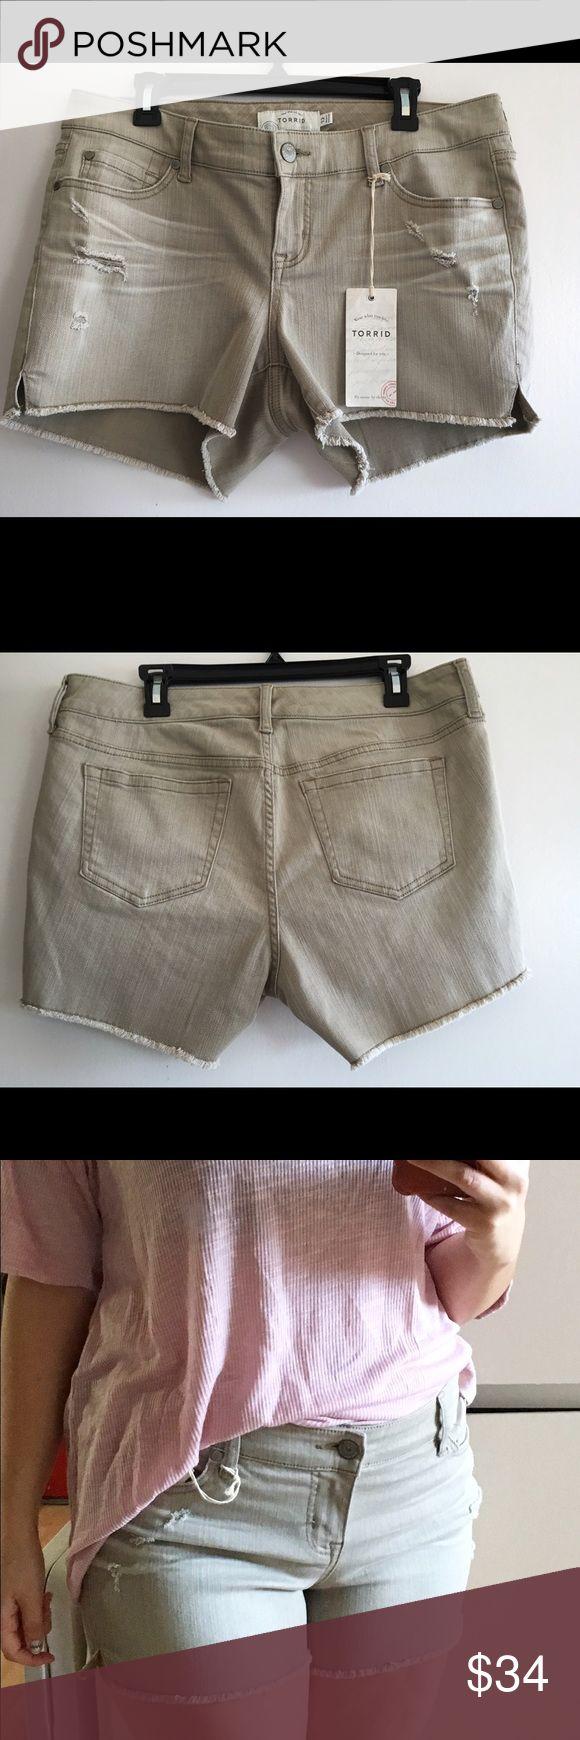 Torrid shorts NWT Torrid 12 desert sand jean shorts NWT ! torrid Shorts